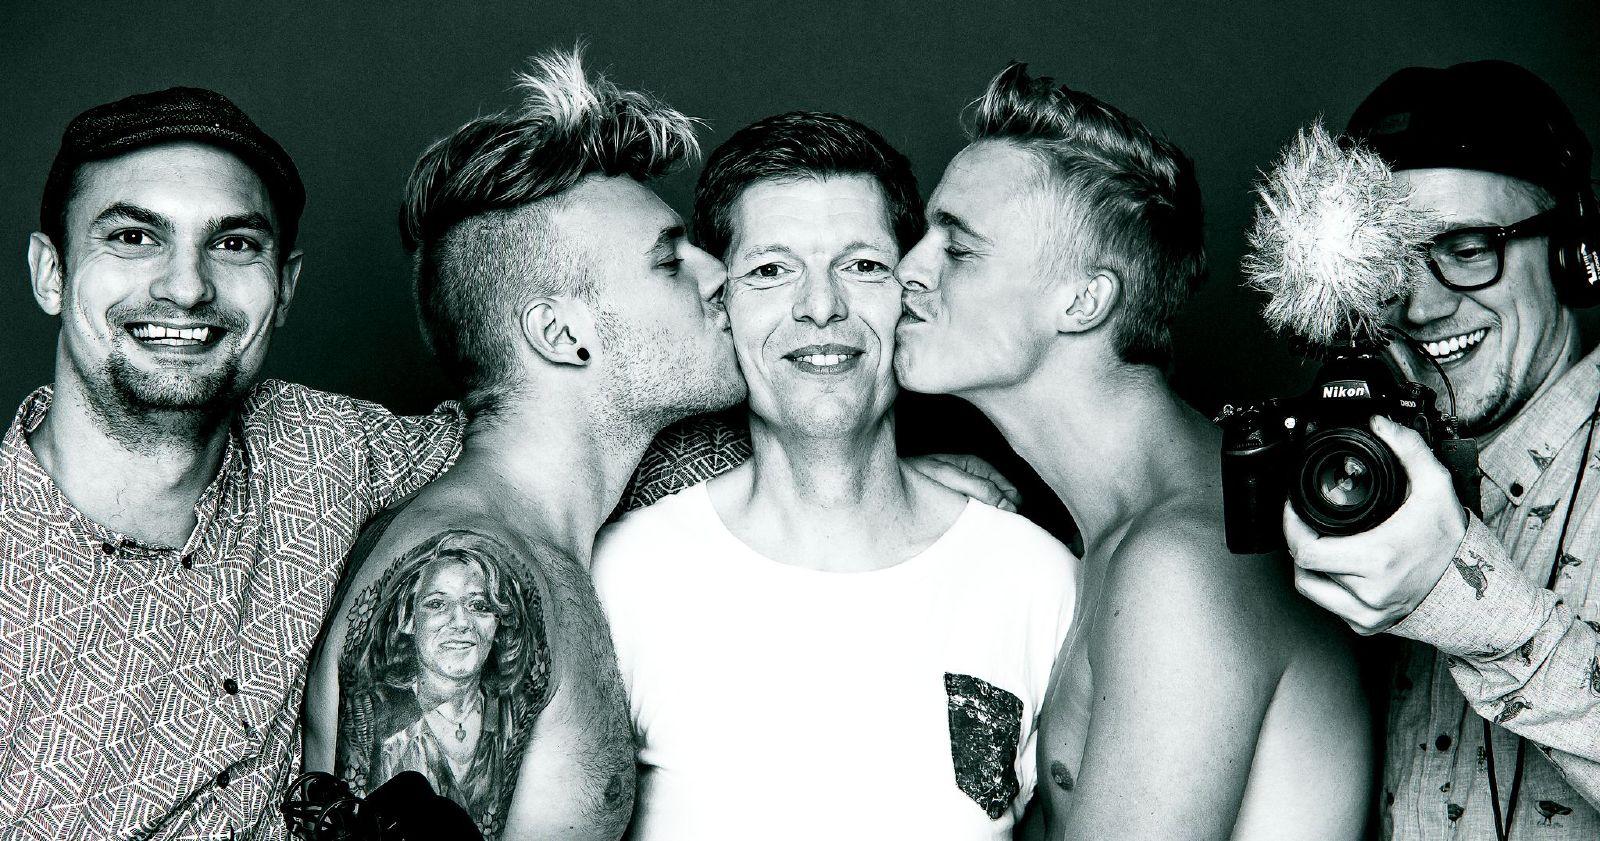 Foto: Stephen Freiheit Models: Lars Taysen – hiv-smittet, Frederik og Jacob Balling – ikke hiv-smittet and of course Two Tall Men!